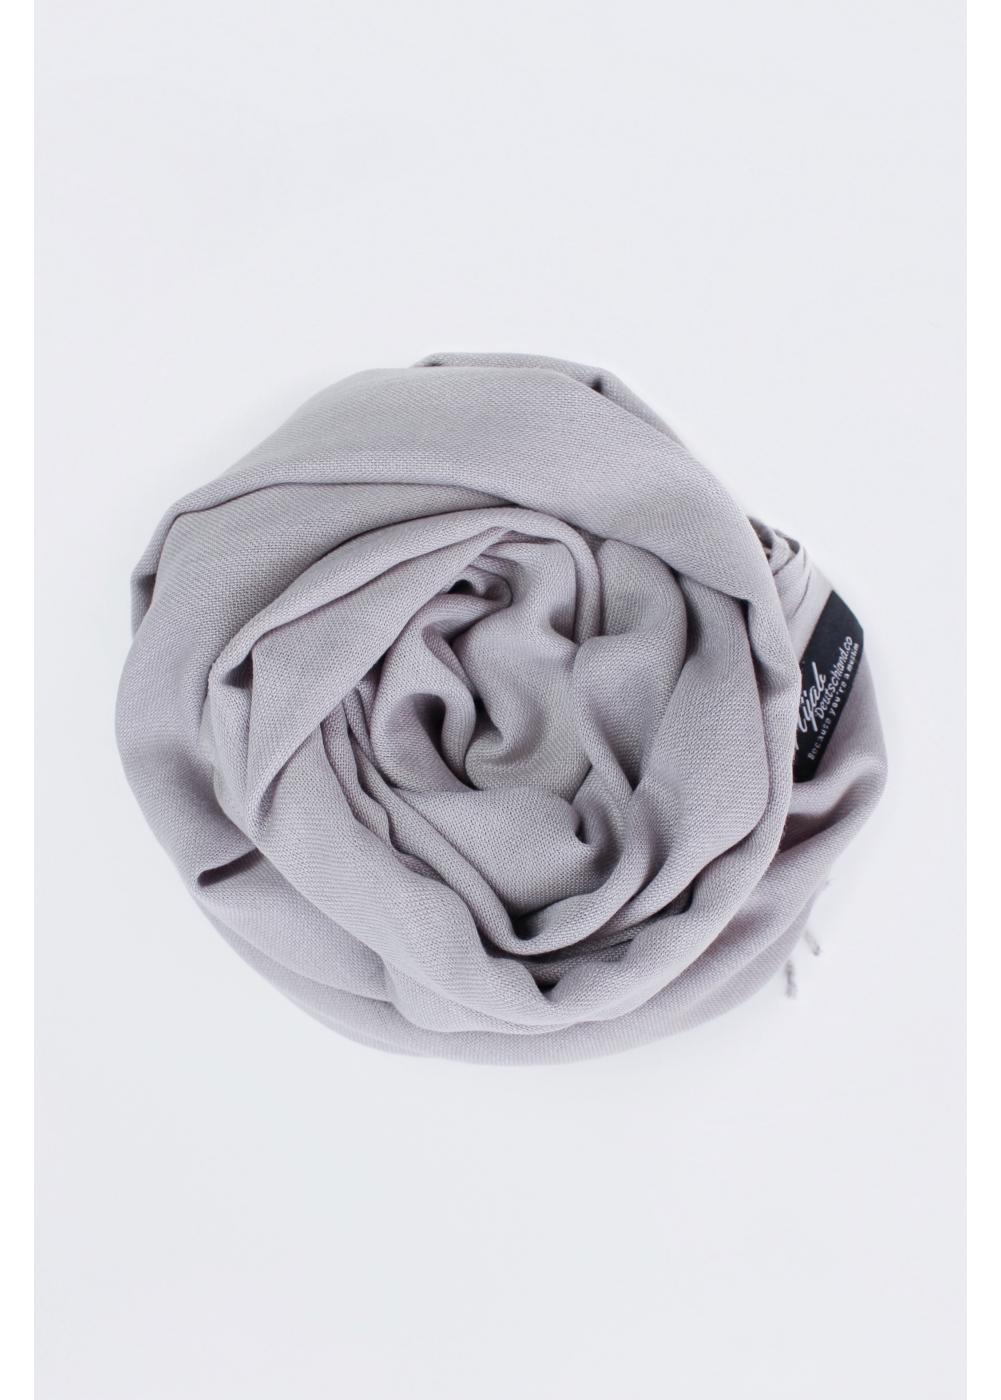 Pashmina hijab Light gray